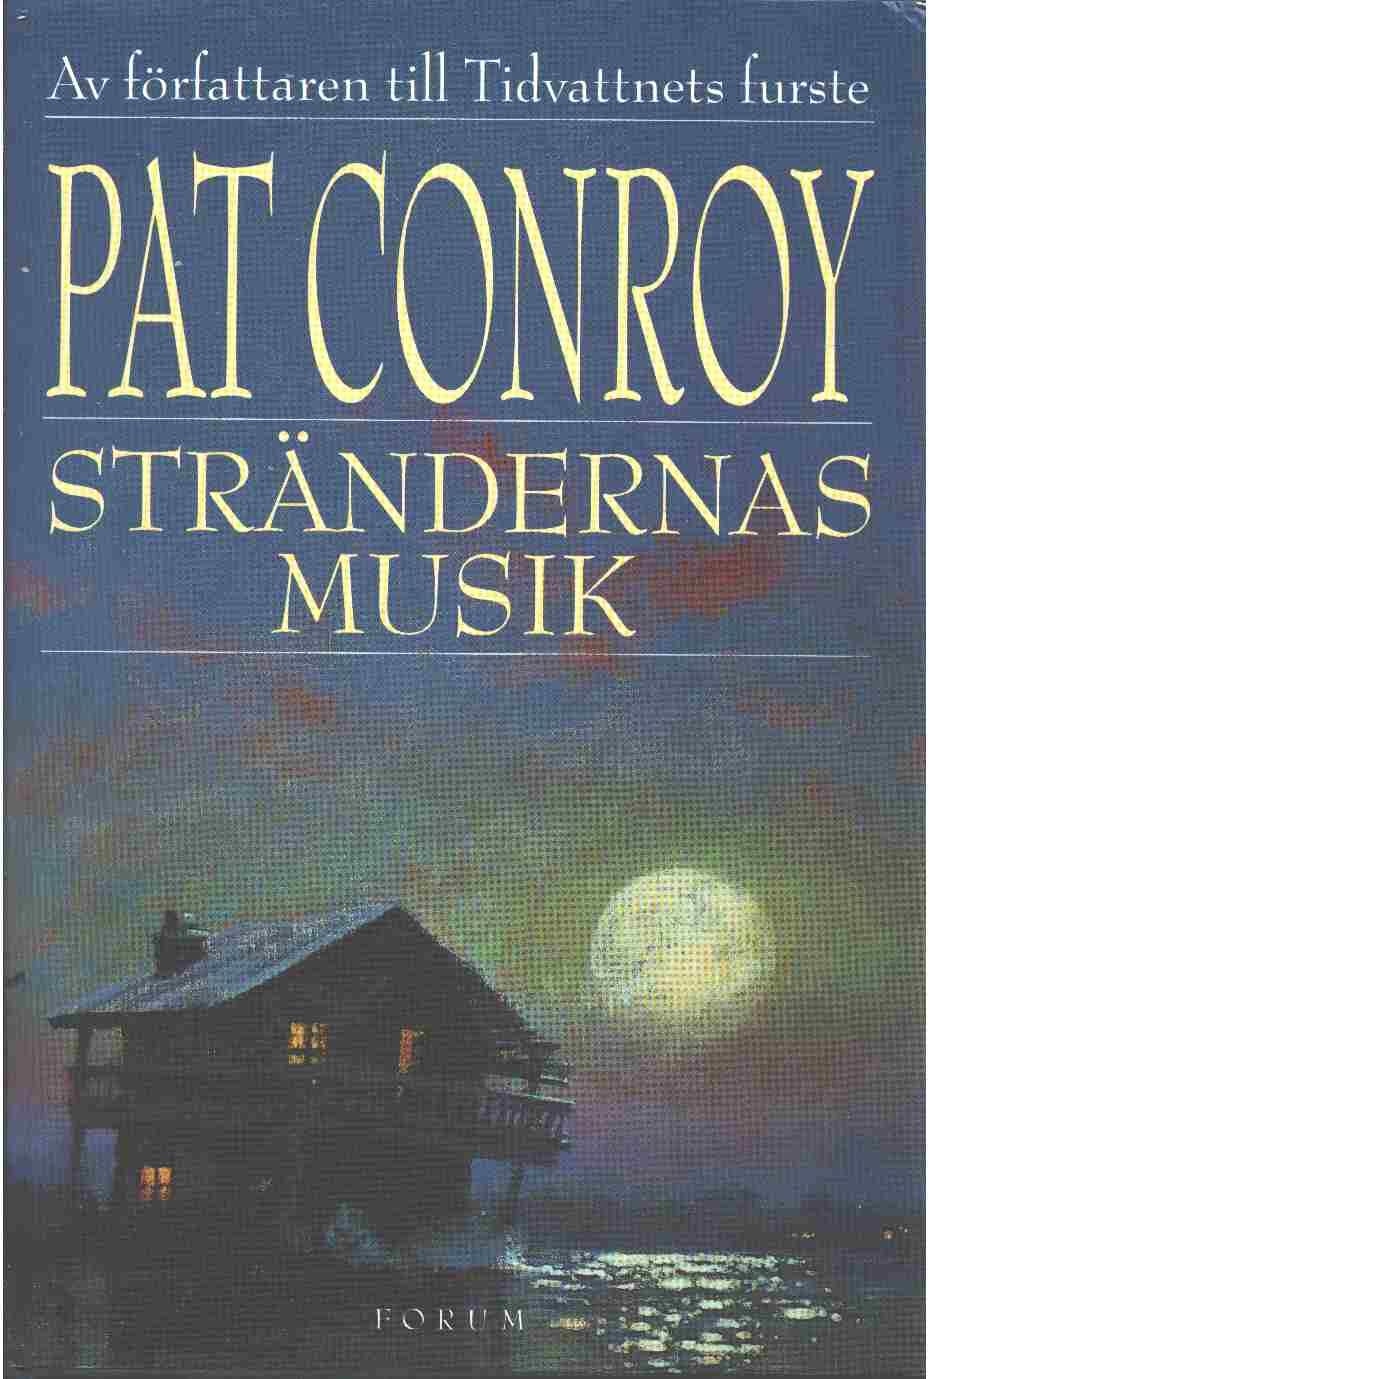 Strändernas musik - Conroy, Pat